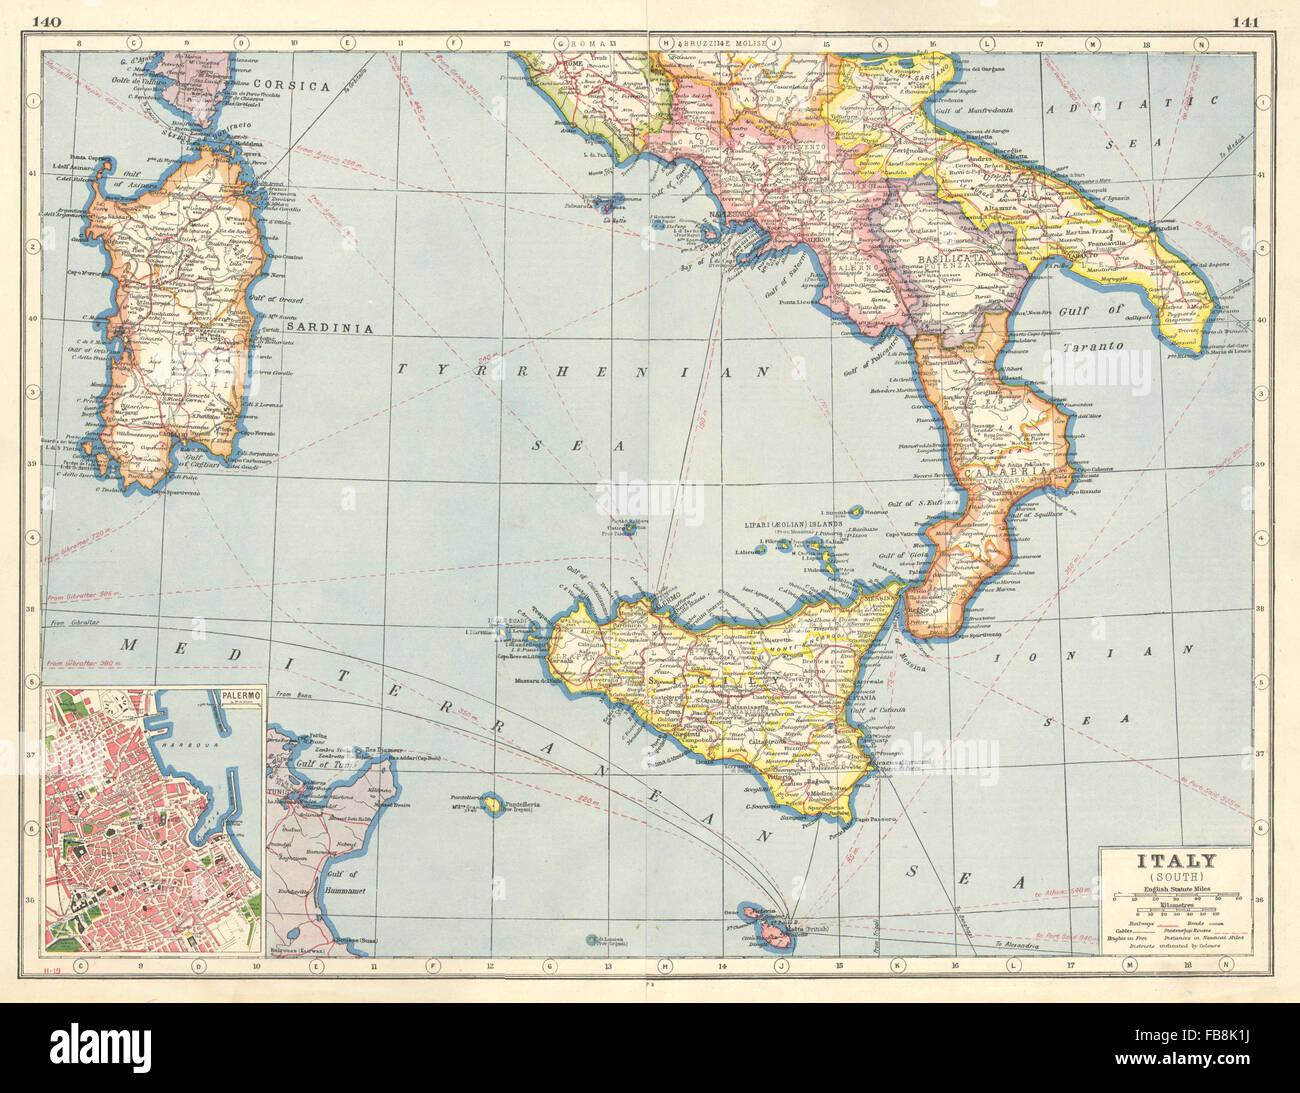 Hejas Asir British Empire Chosen Rio de Oro Siam 1920 old map WORLD POLITICAL